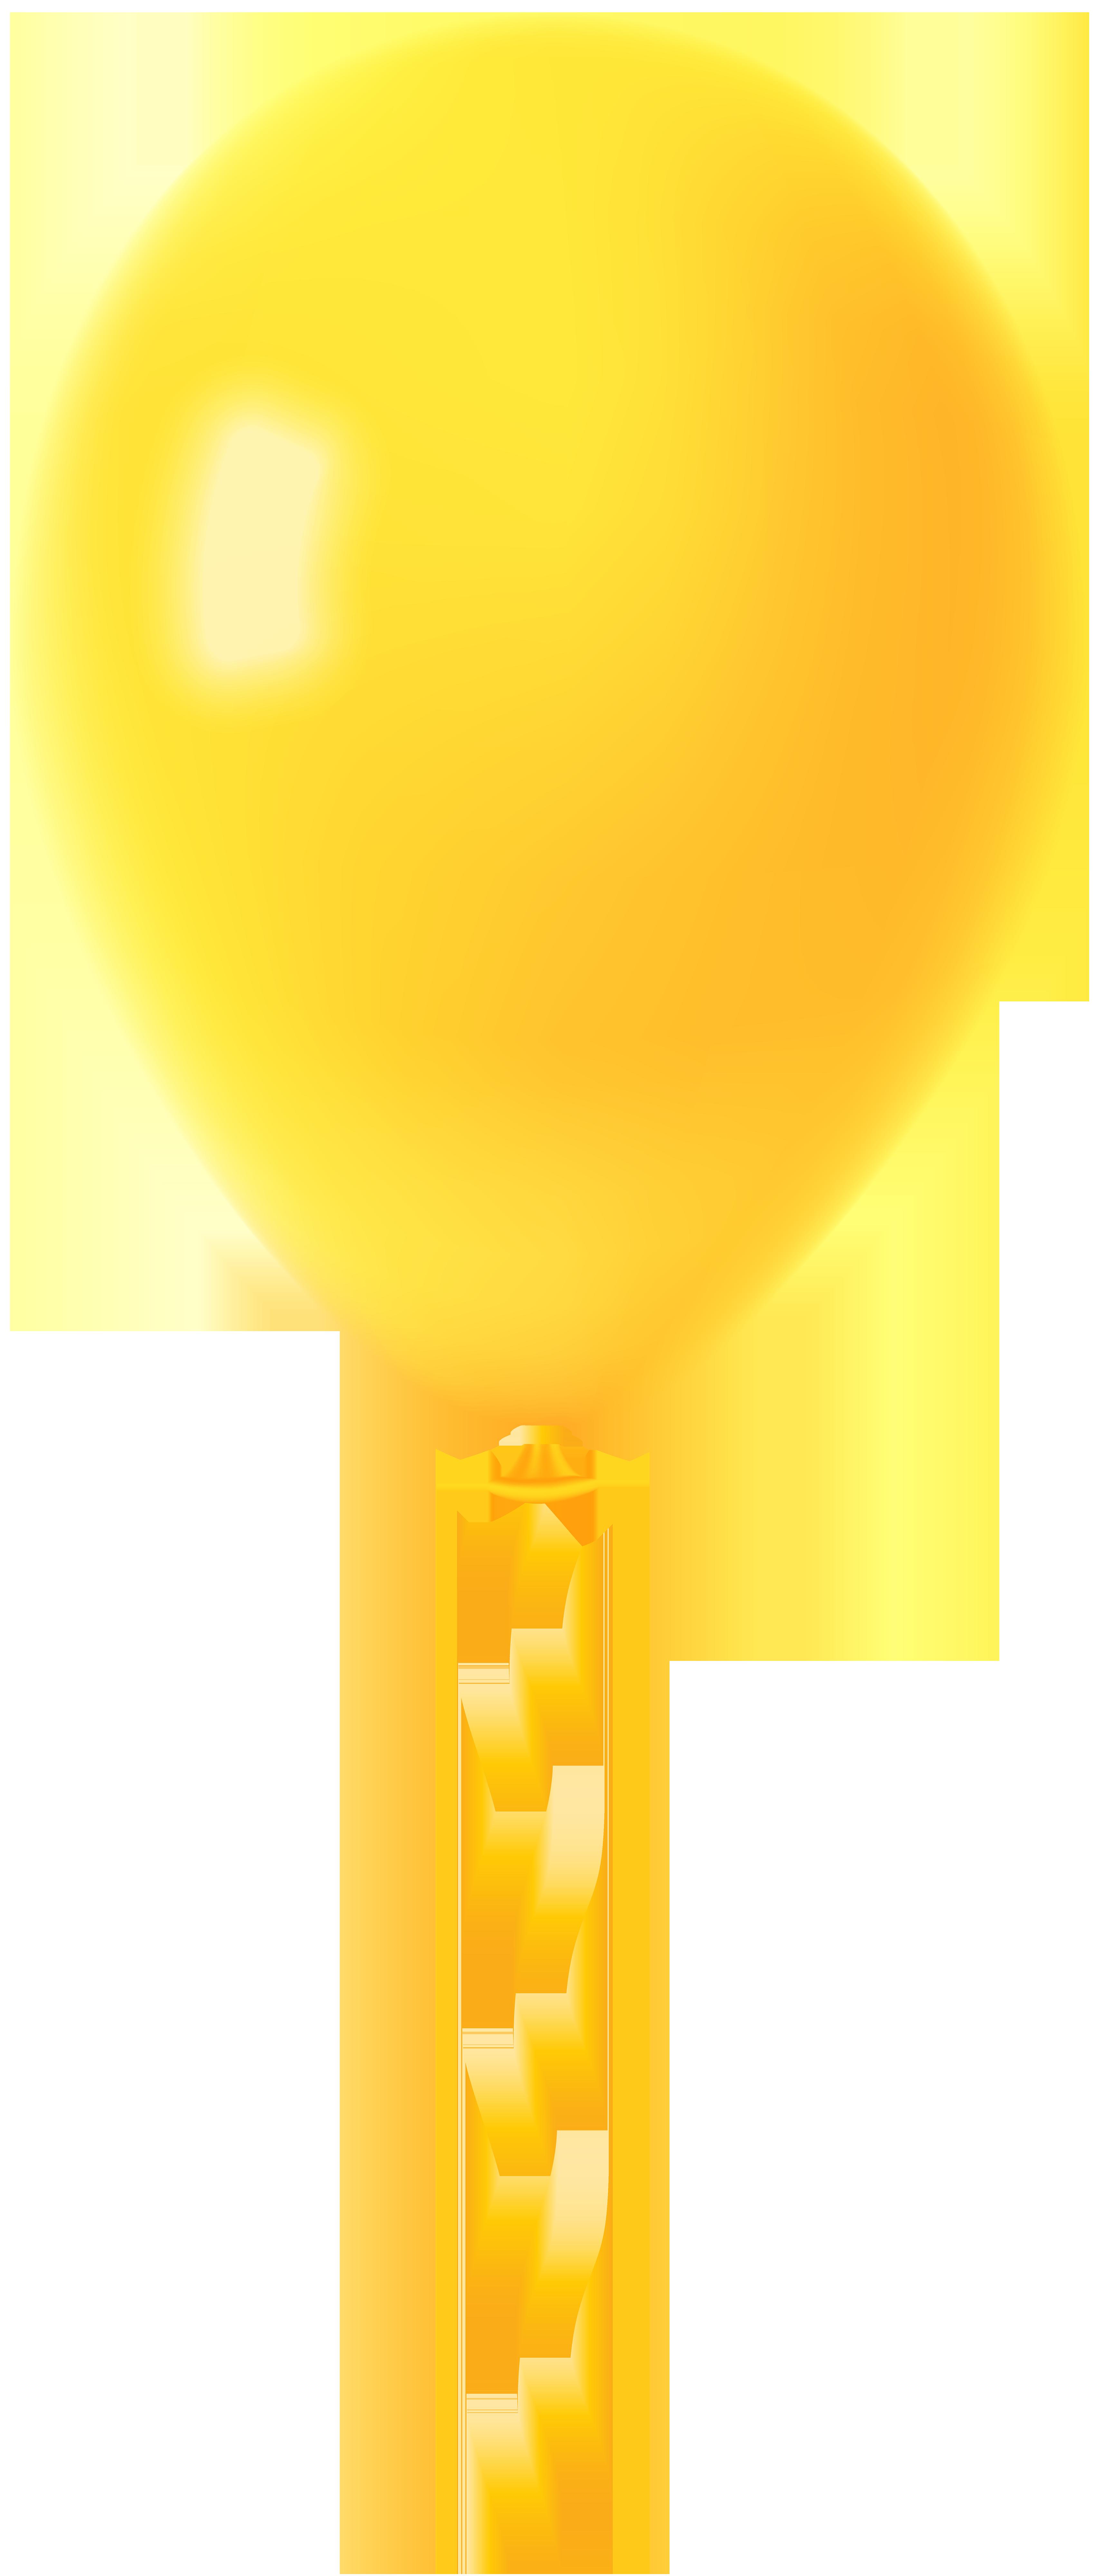 Yellow Balloon Transparent PNG Clip Art Image.